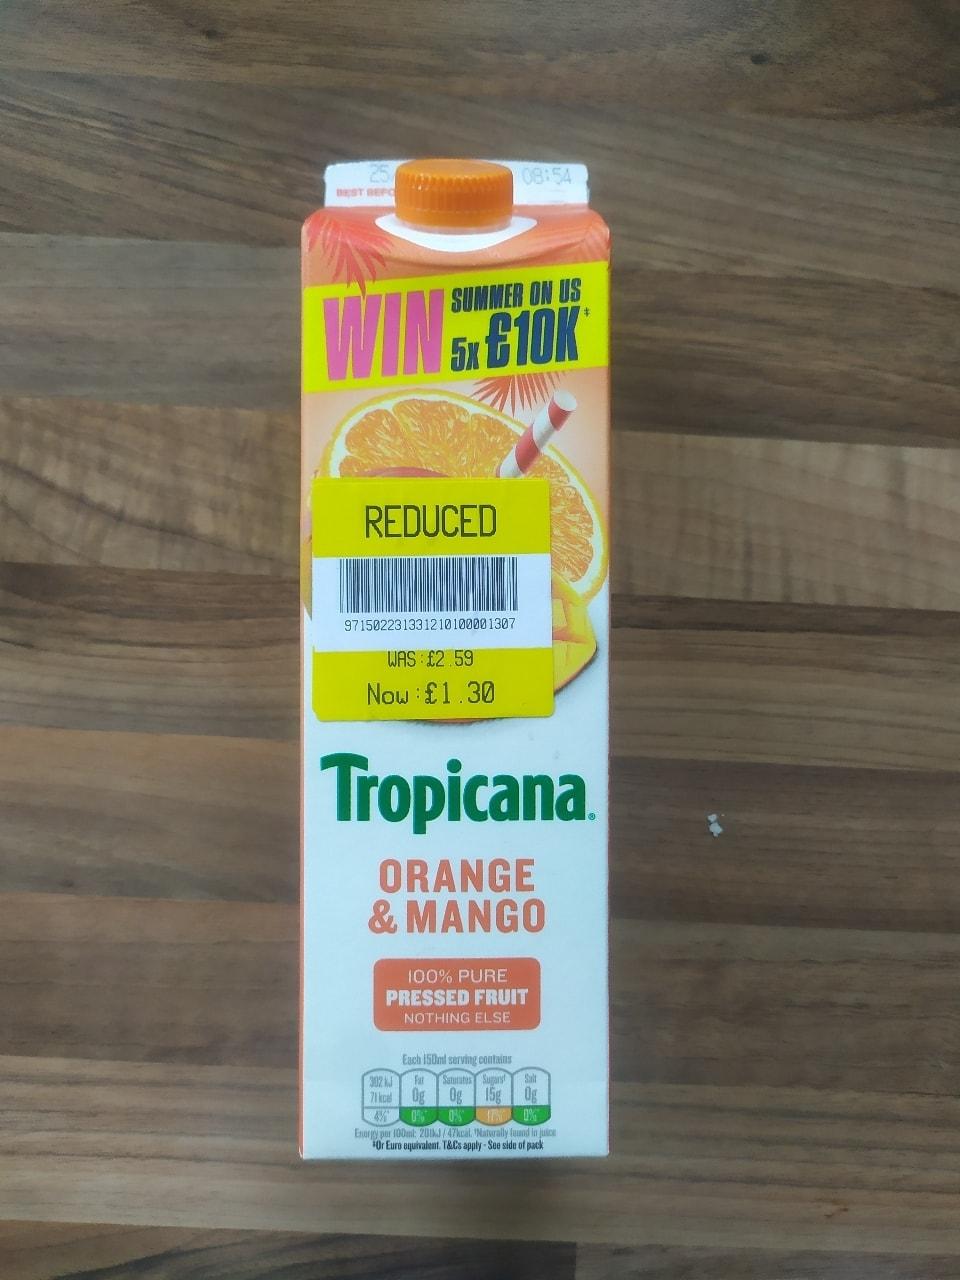 Tropicana Orange and Mango